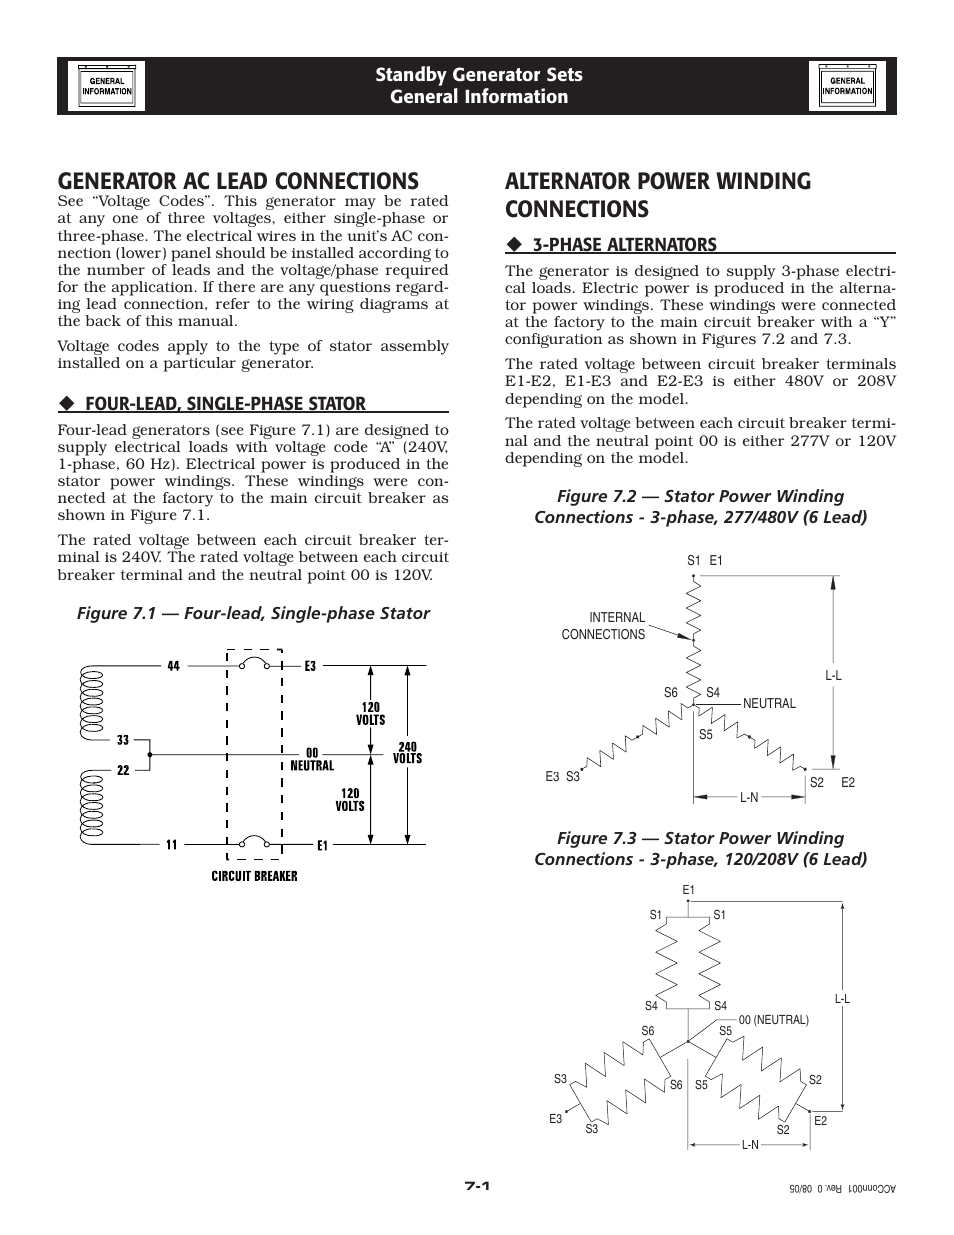 Generator Ac Lead Connections  Alternator Power Winding